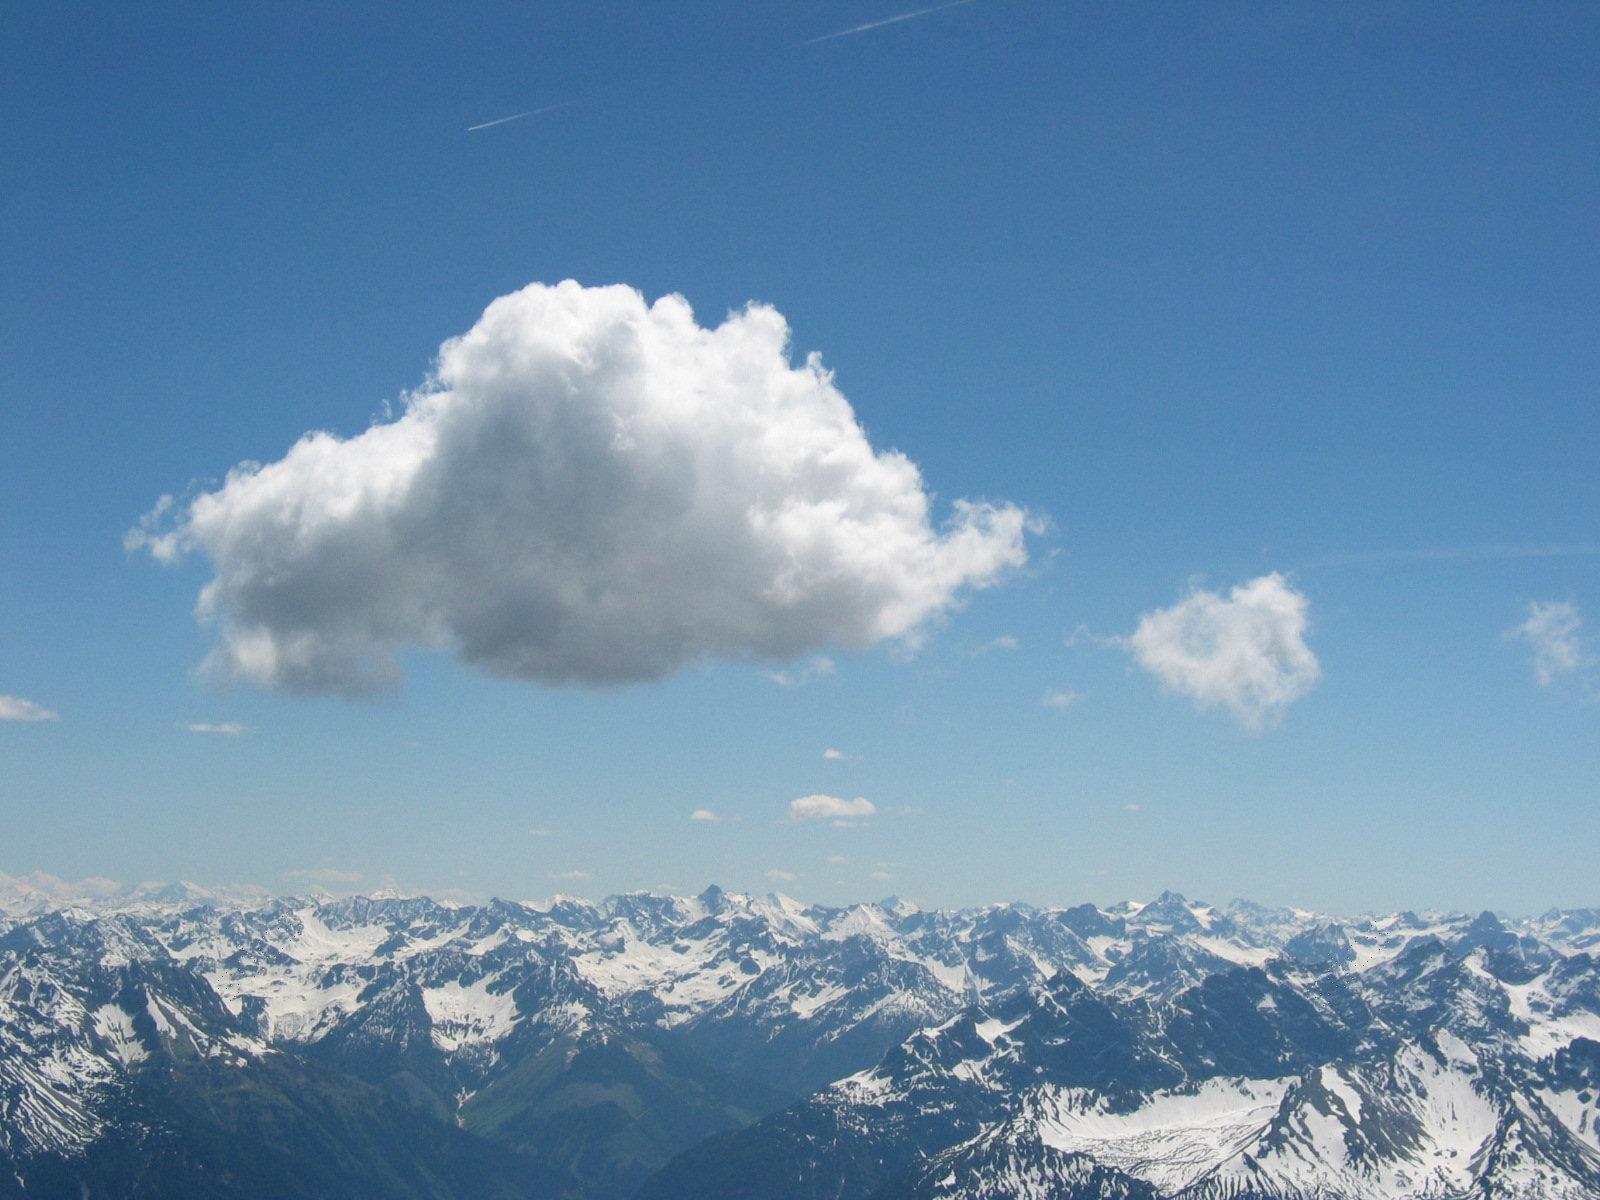 http://dic.academic.ru/pictures/wiki/files/73/Img20050526_0007_at_tannheim_cumulus.jpg